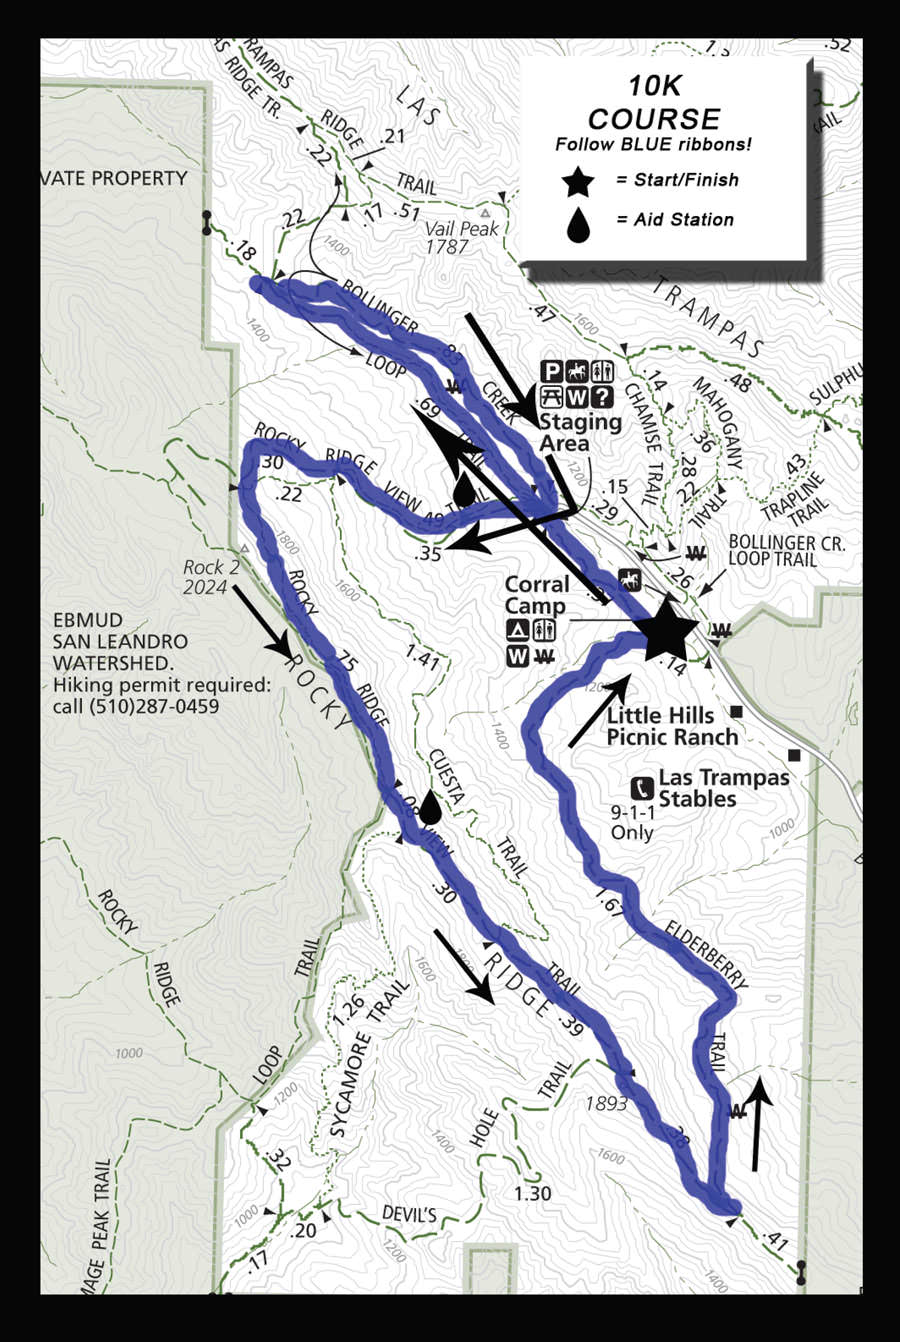 Rocky-Ridge-10K-Course-Map